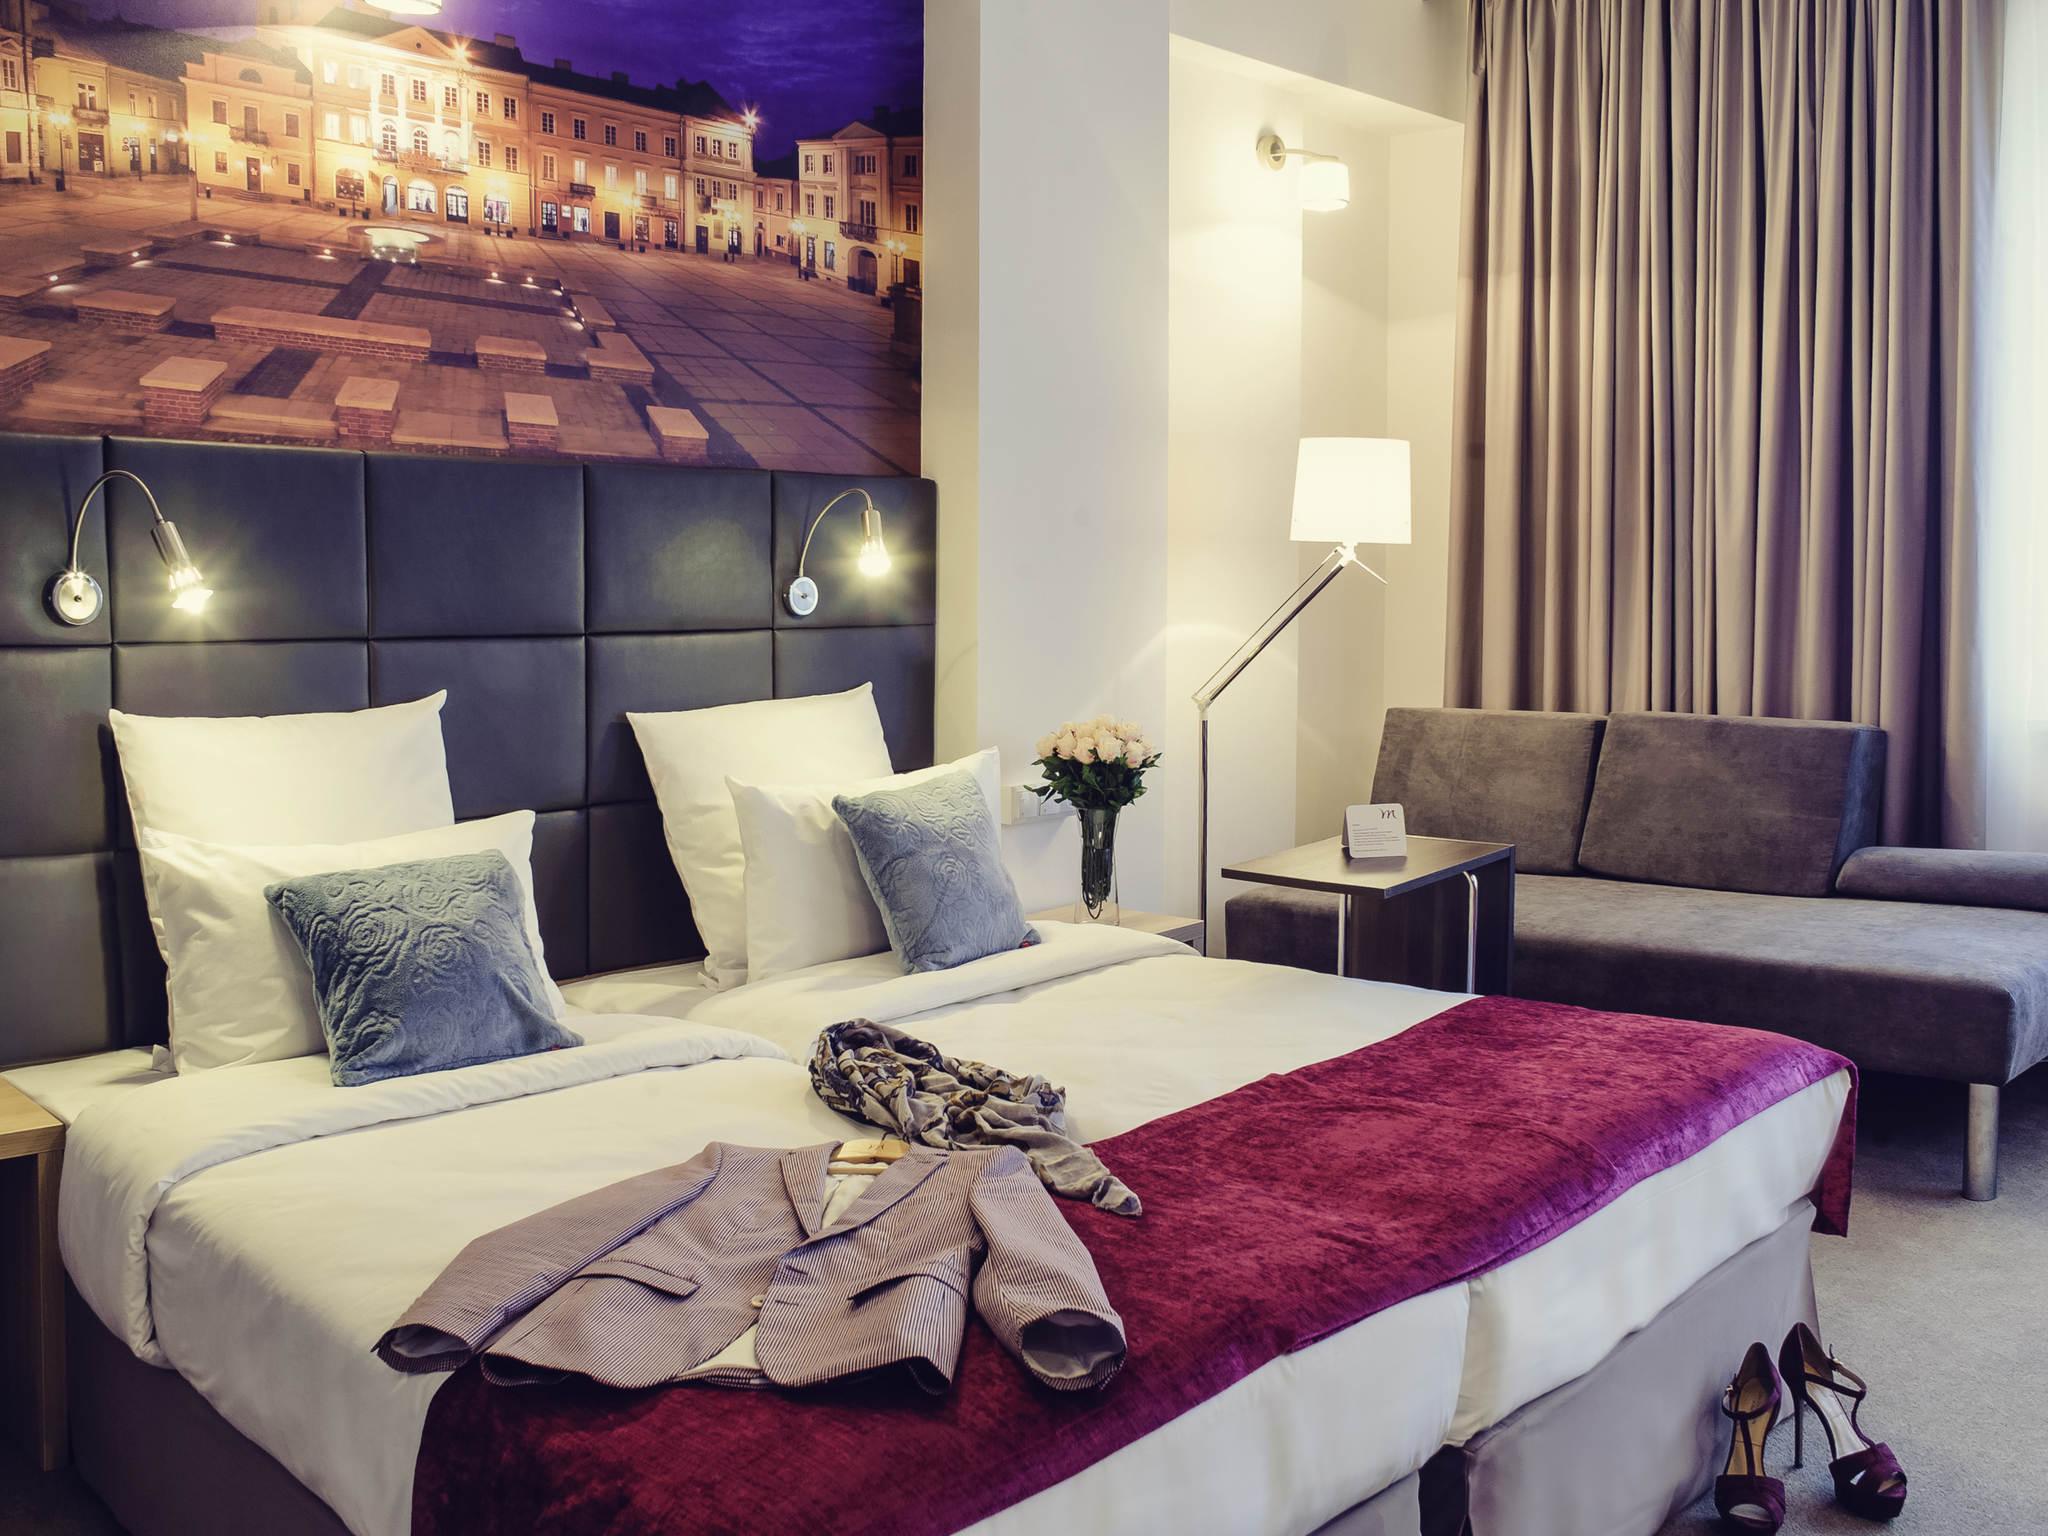 Hotel - Hotel Mercure Piotrkow Tryb. Vestil